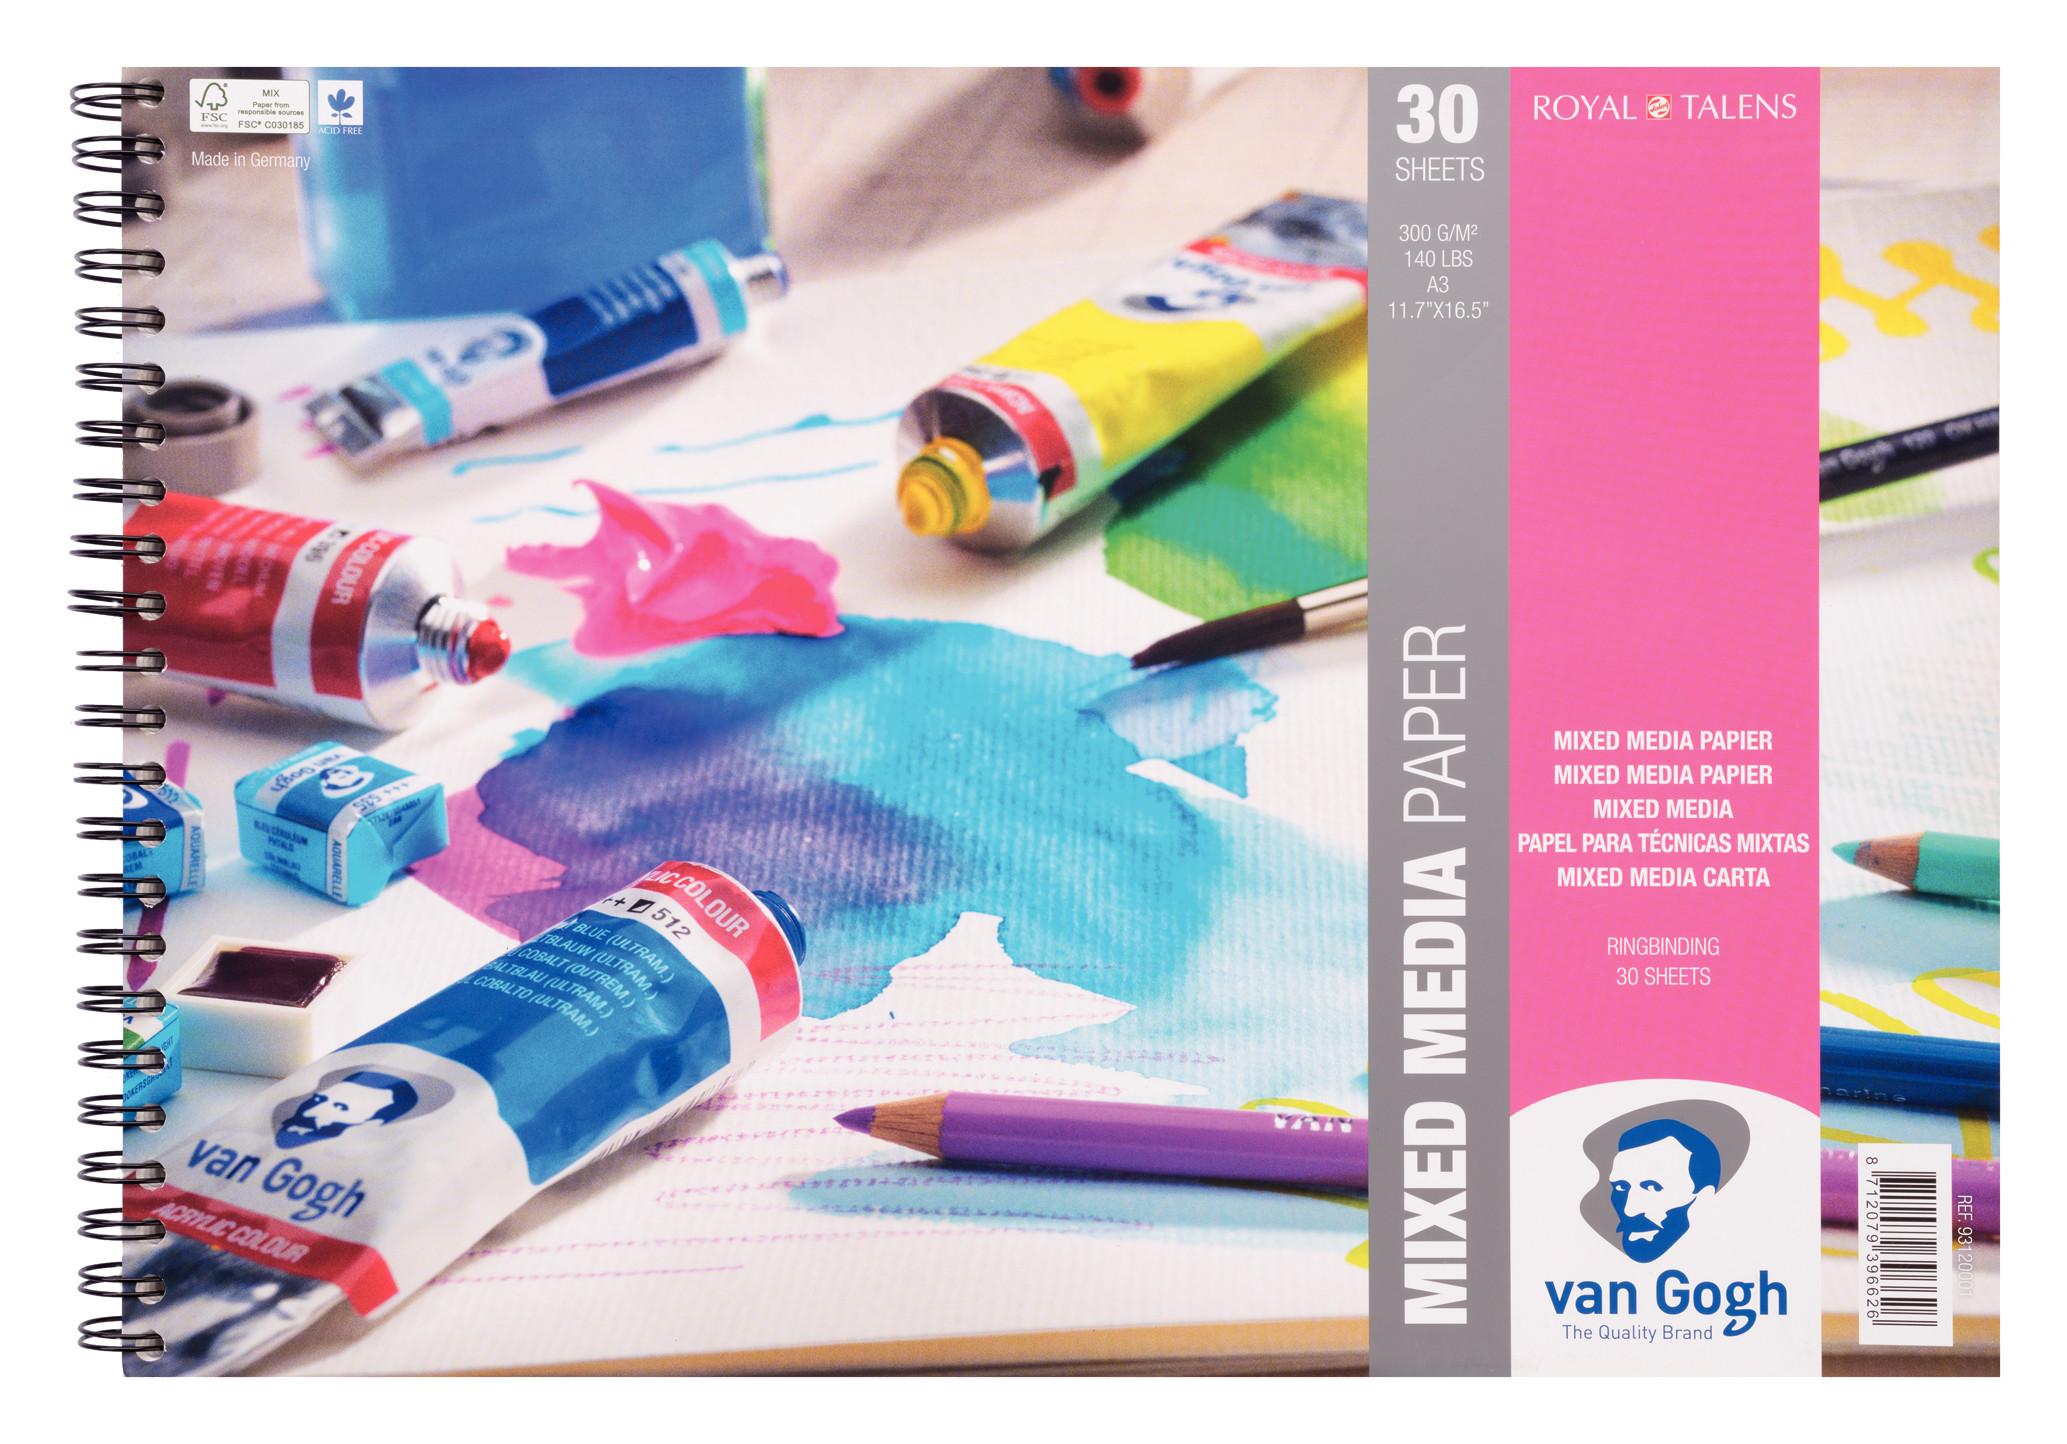 Van Gogh Mixed Media Paper Spiral Bound Pad, 30 Sheets, 300g/140lb., size 42 x 29.7cm (A3) / 11.7 x 16.5